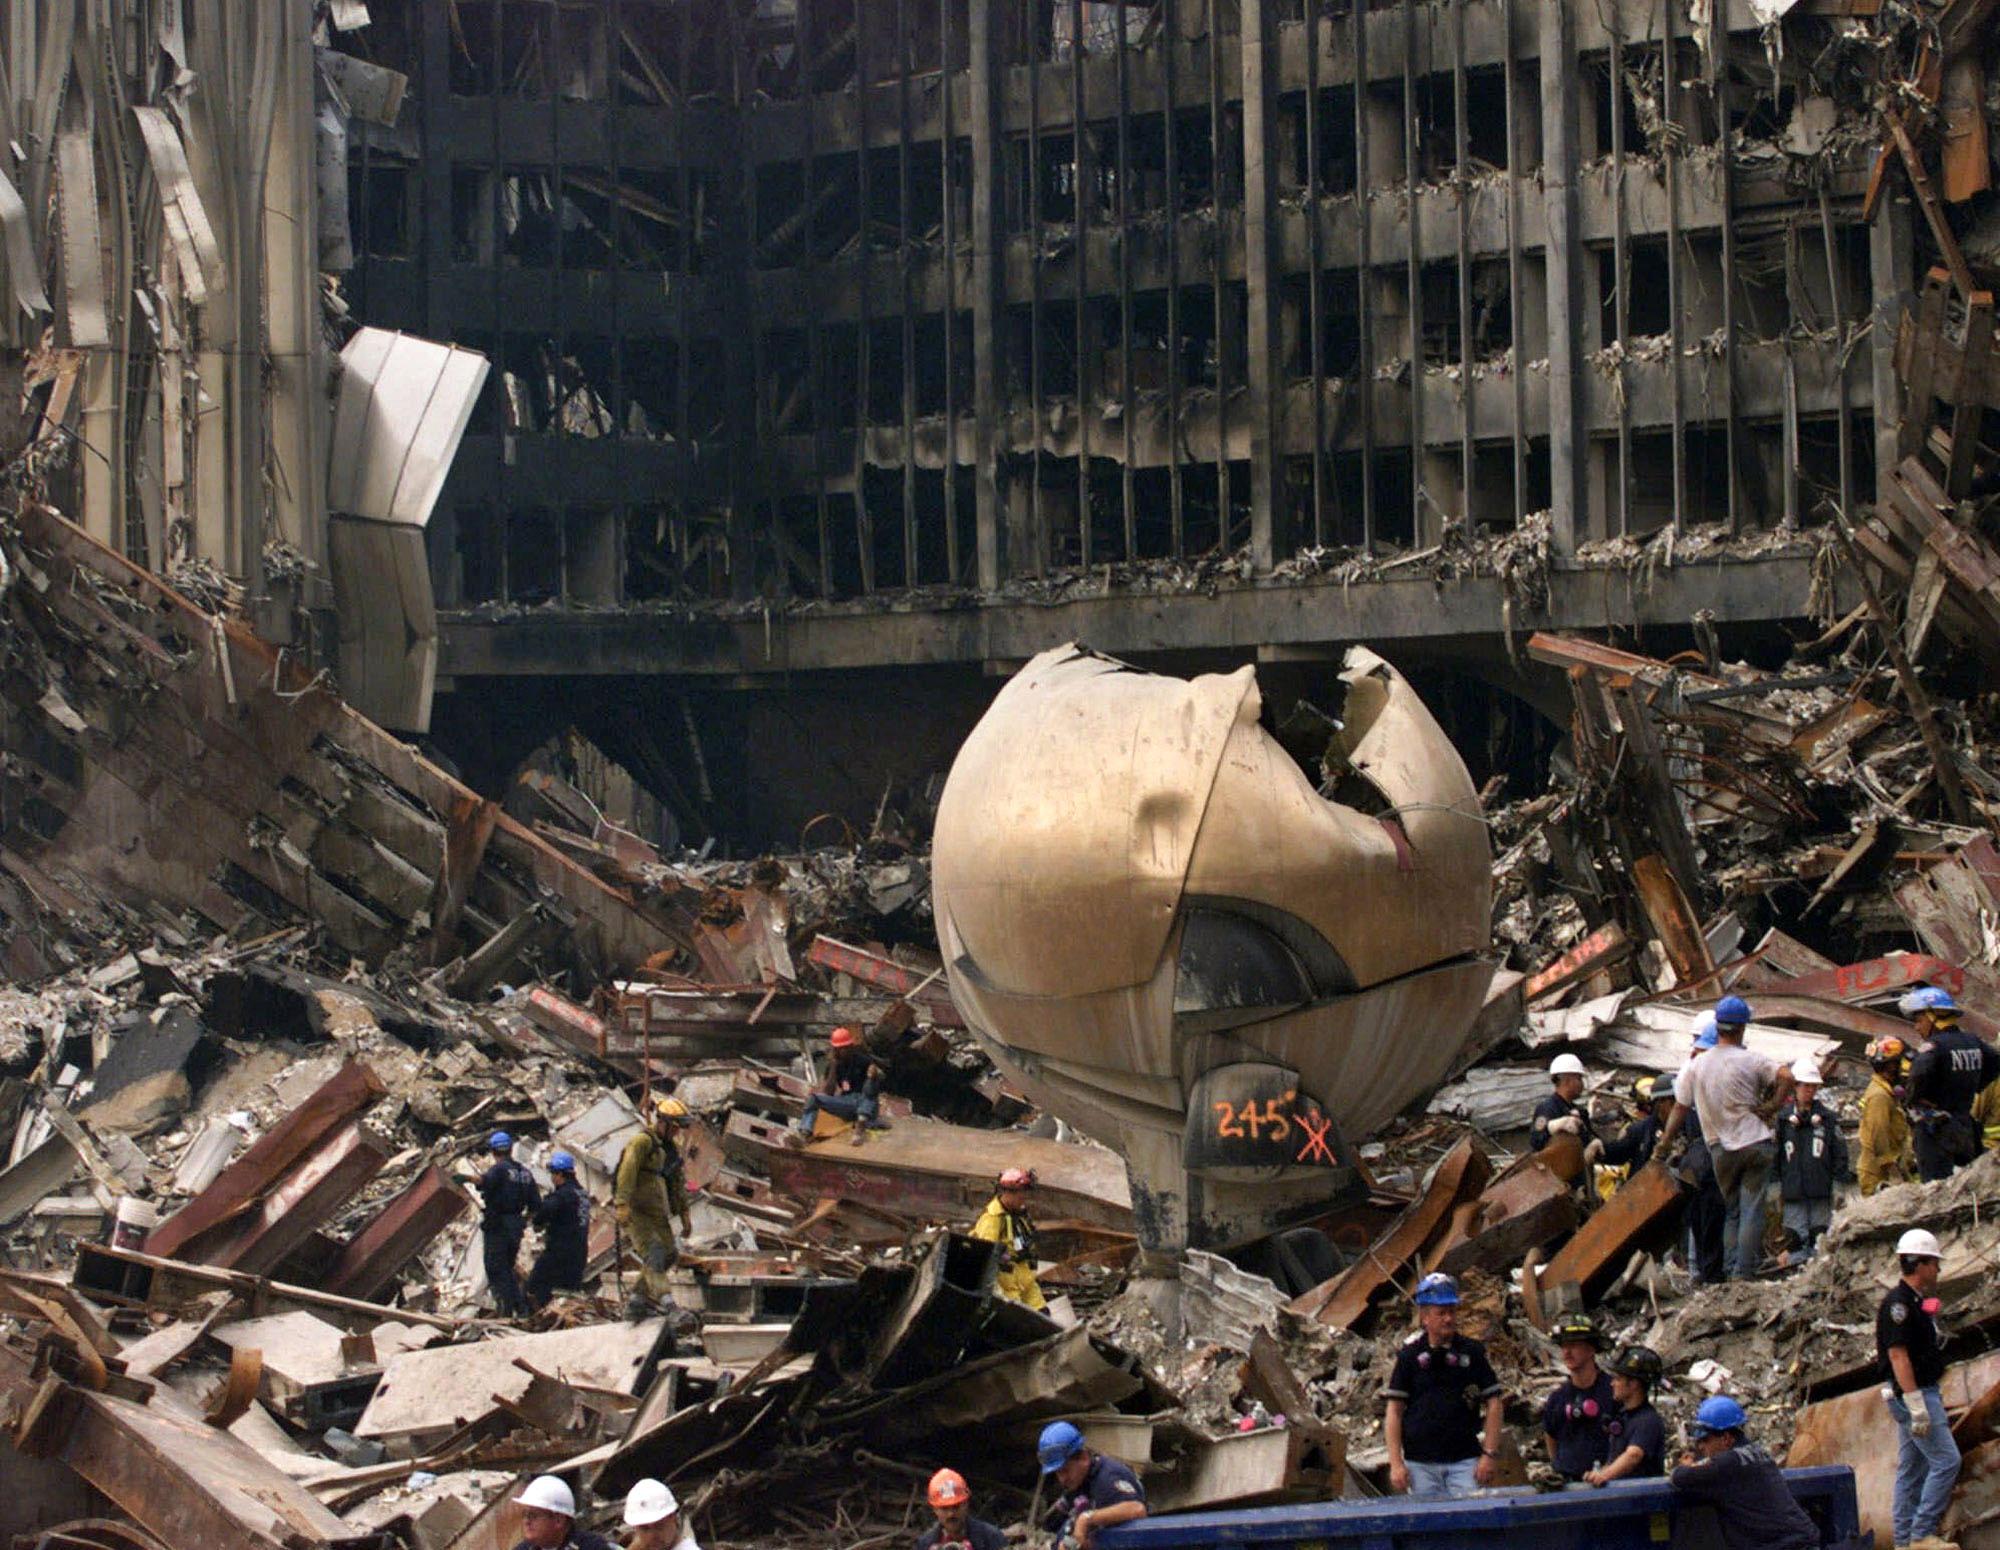 fritz koenig sculptor whose work the sphere withstood 9 11 attack dead at 92 cbs news. Black Bedroom Furniture Sets. Home Design Ideas